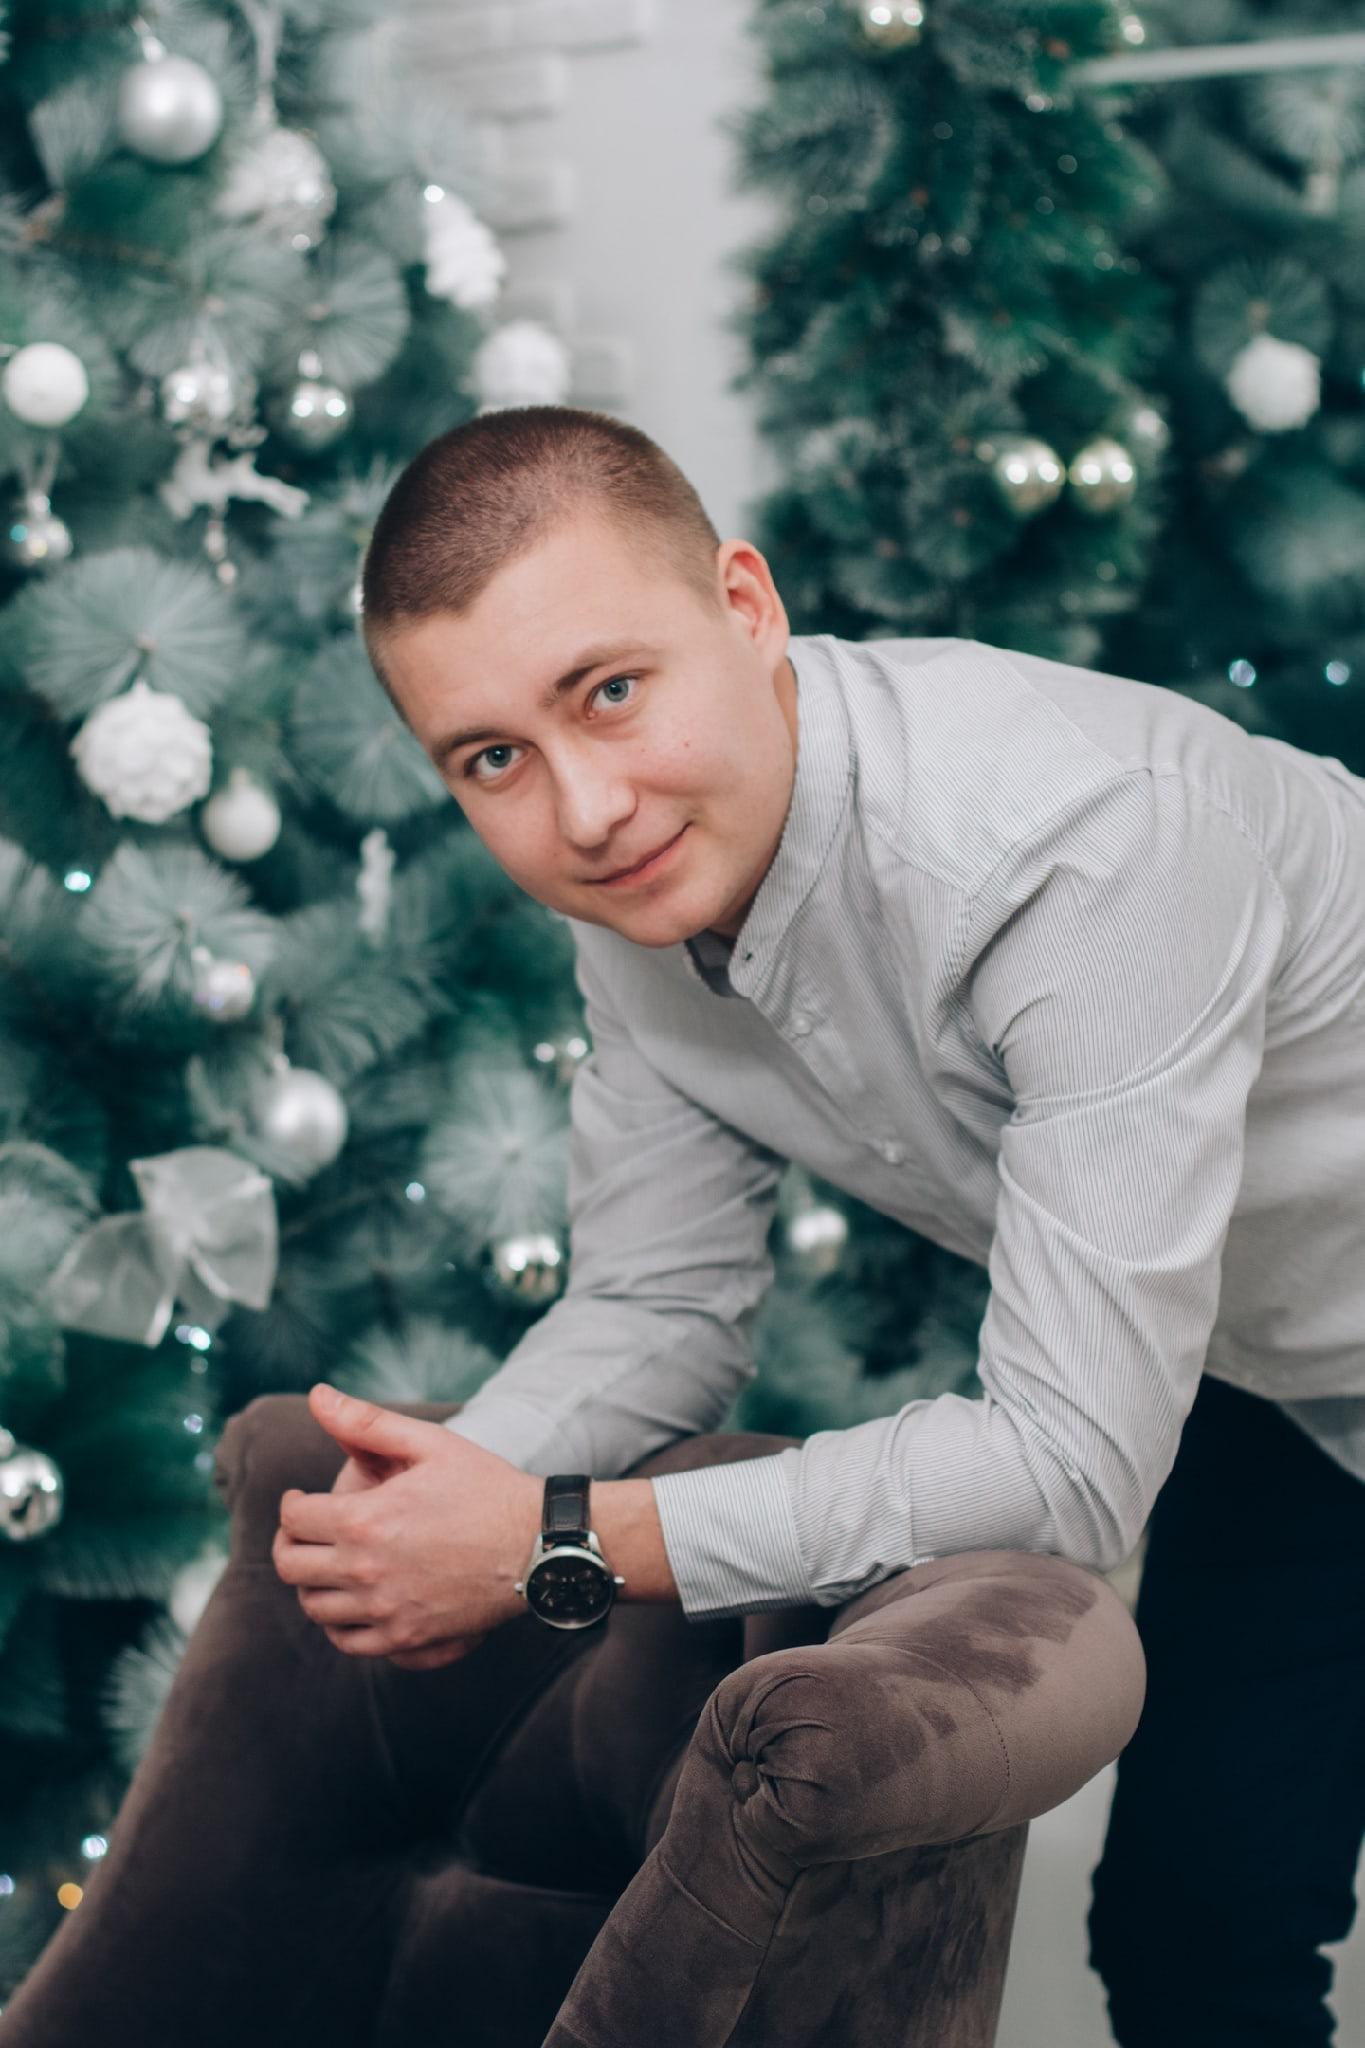 Наиль Ильгамович Галяутдинов